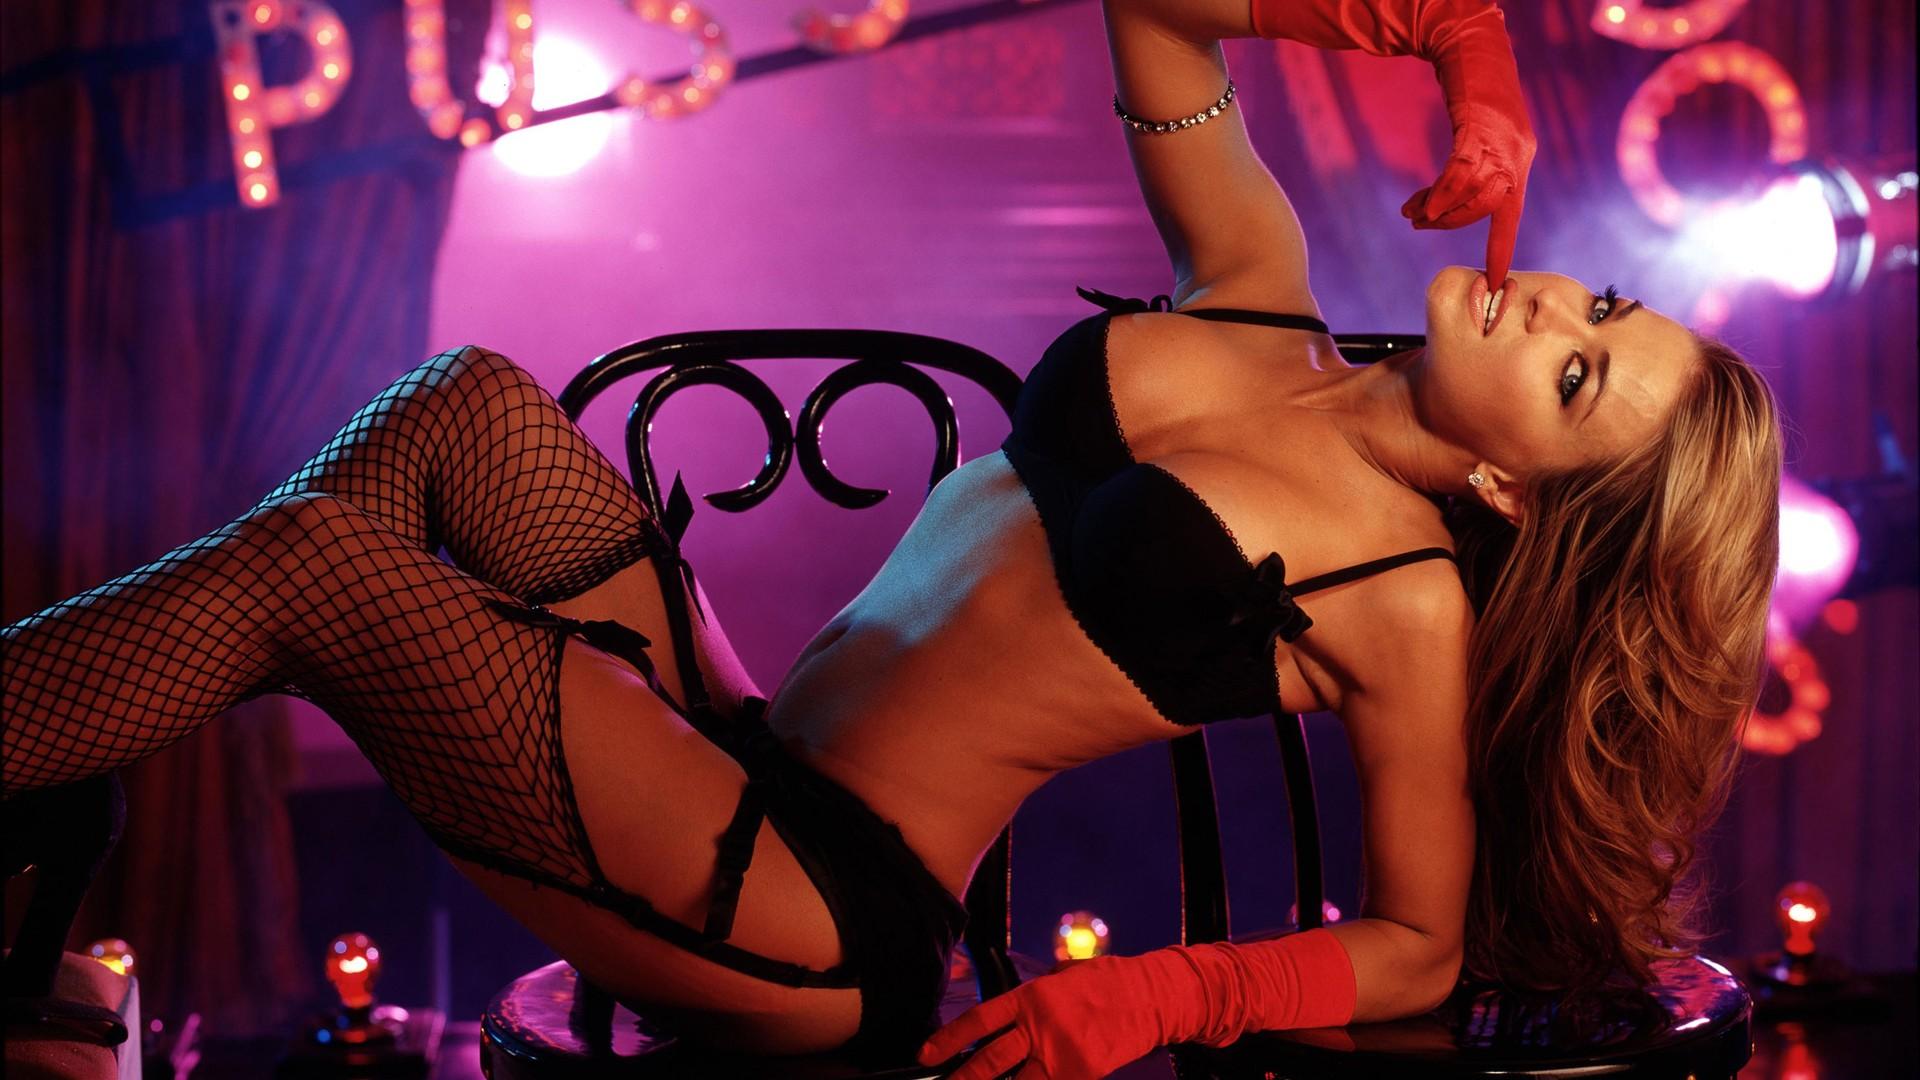 Strip club sex party girls